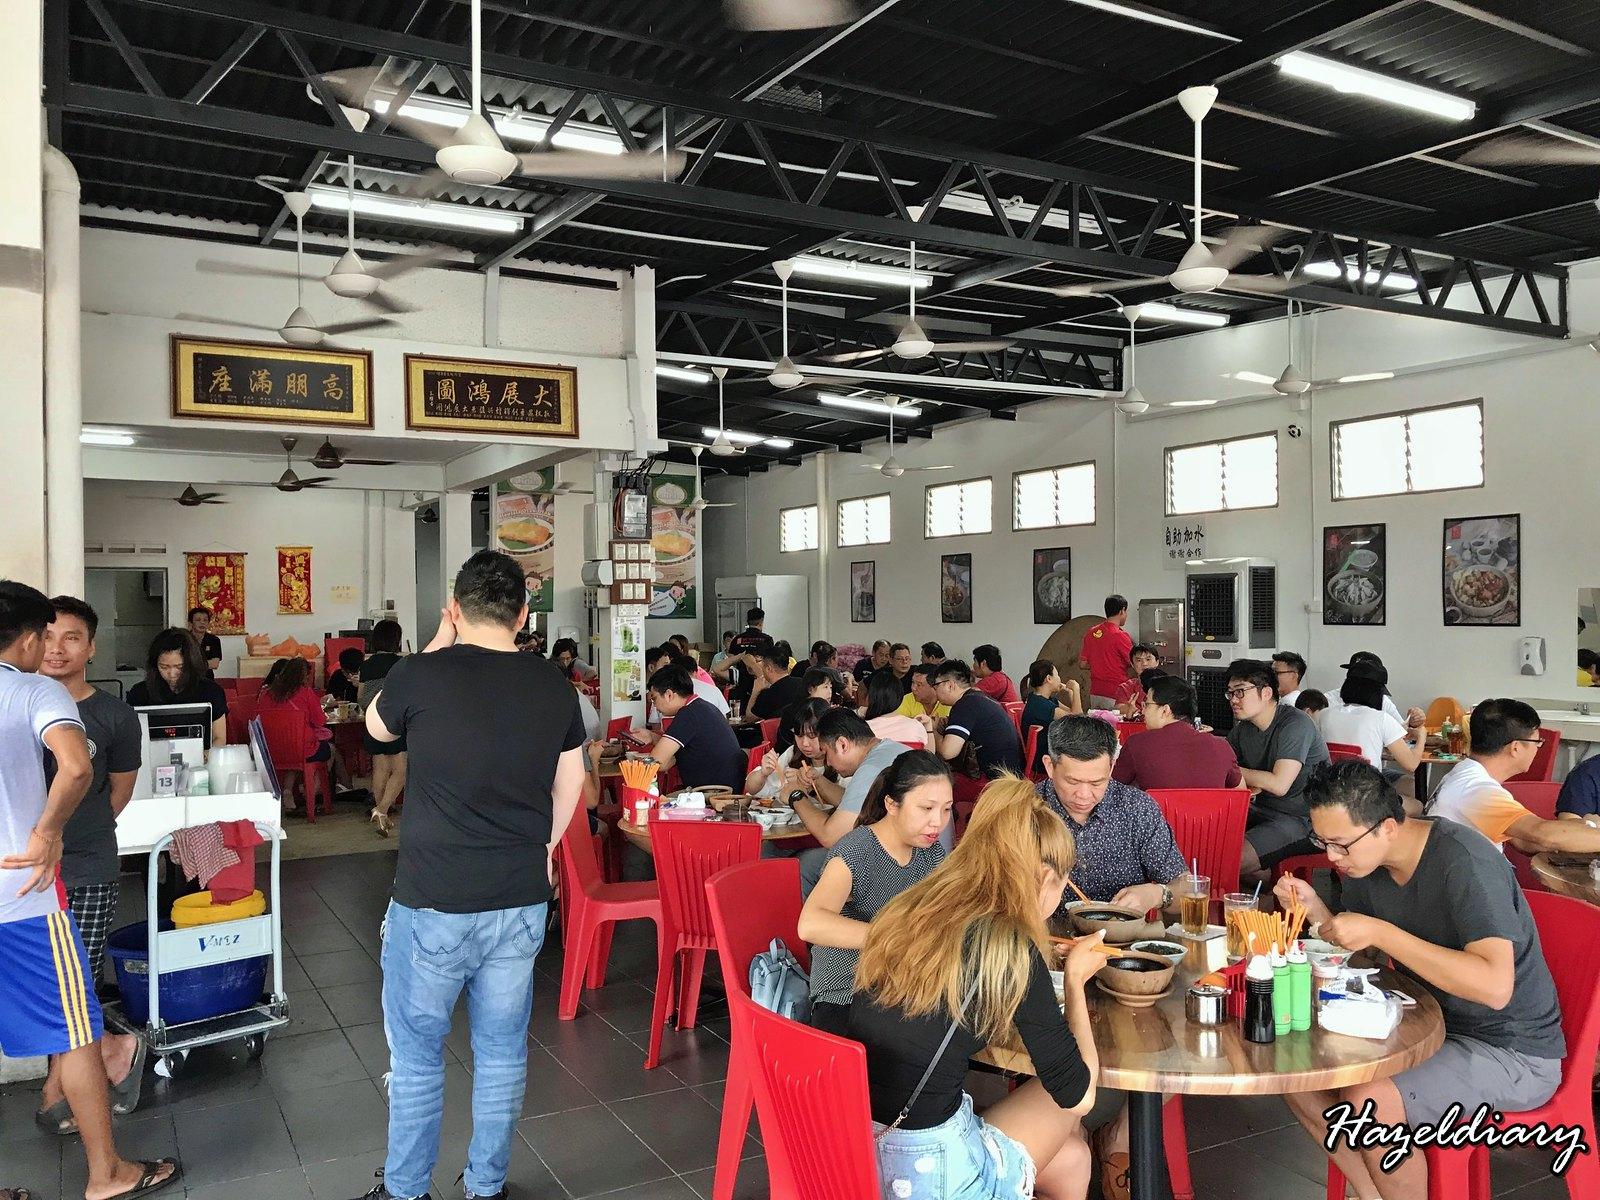 Restoran Kota Zheng Zhong-Bak Kut Teh-Hazeldiary-2